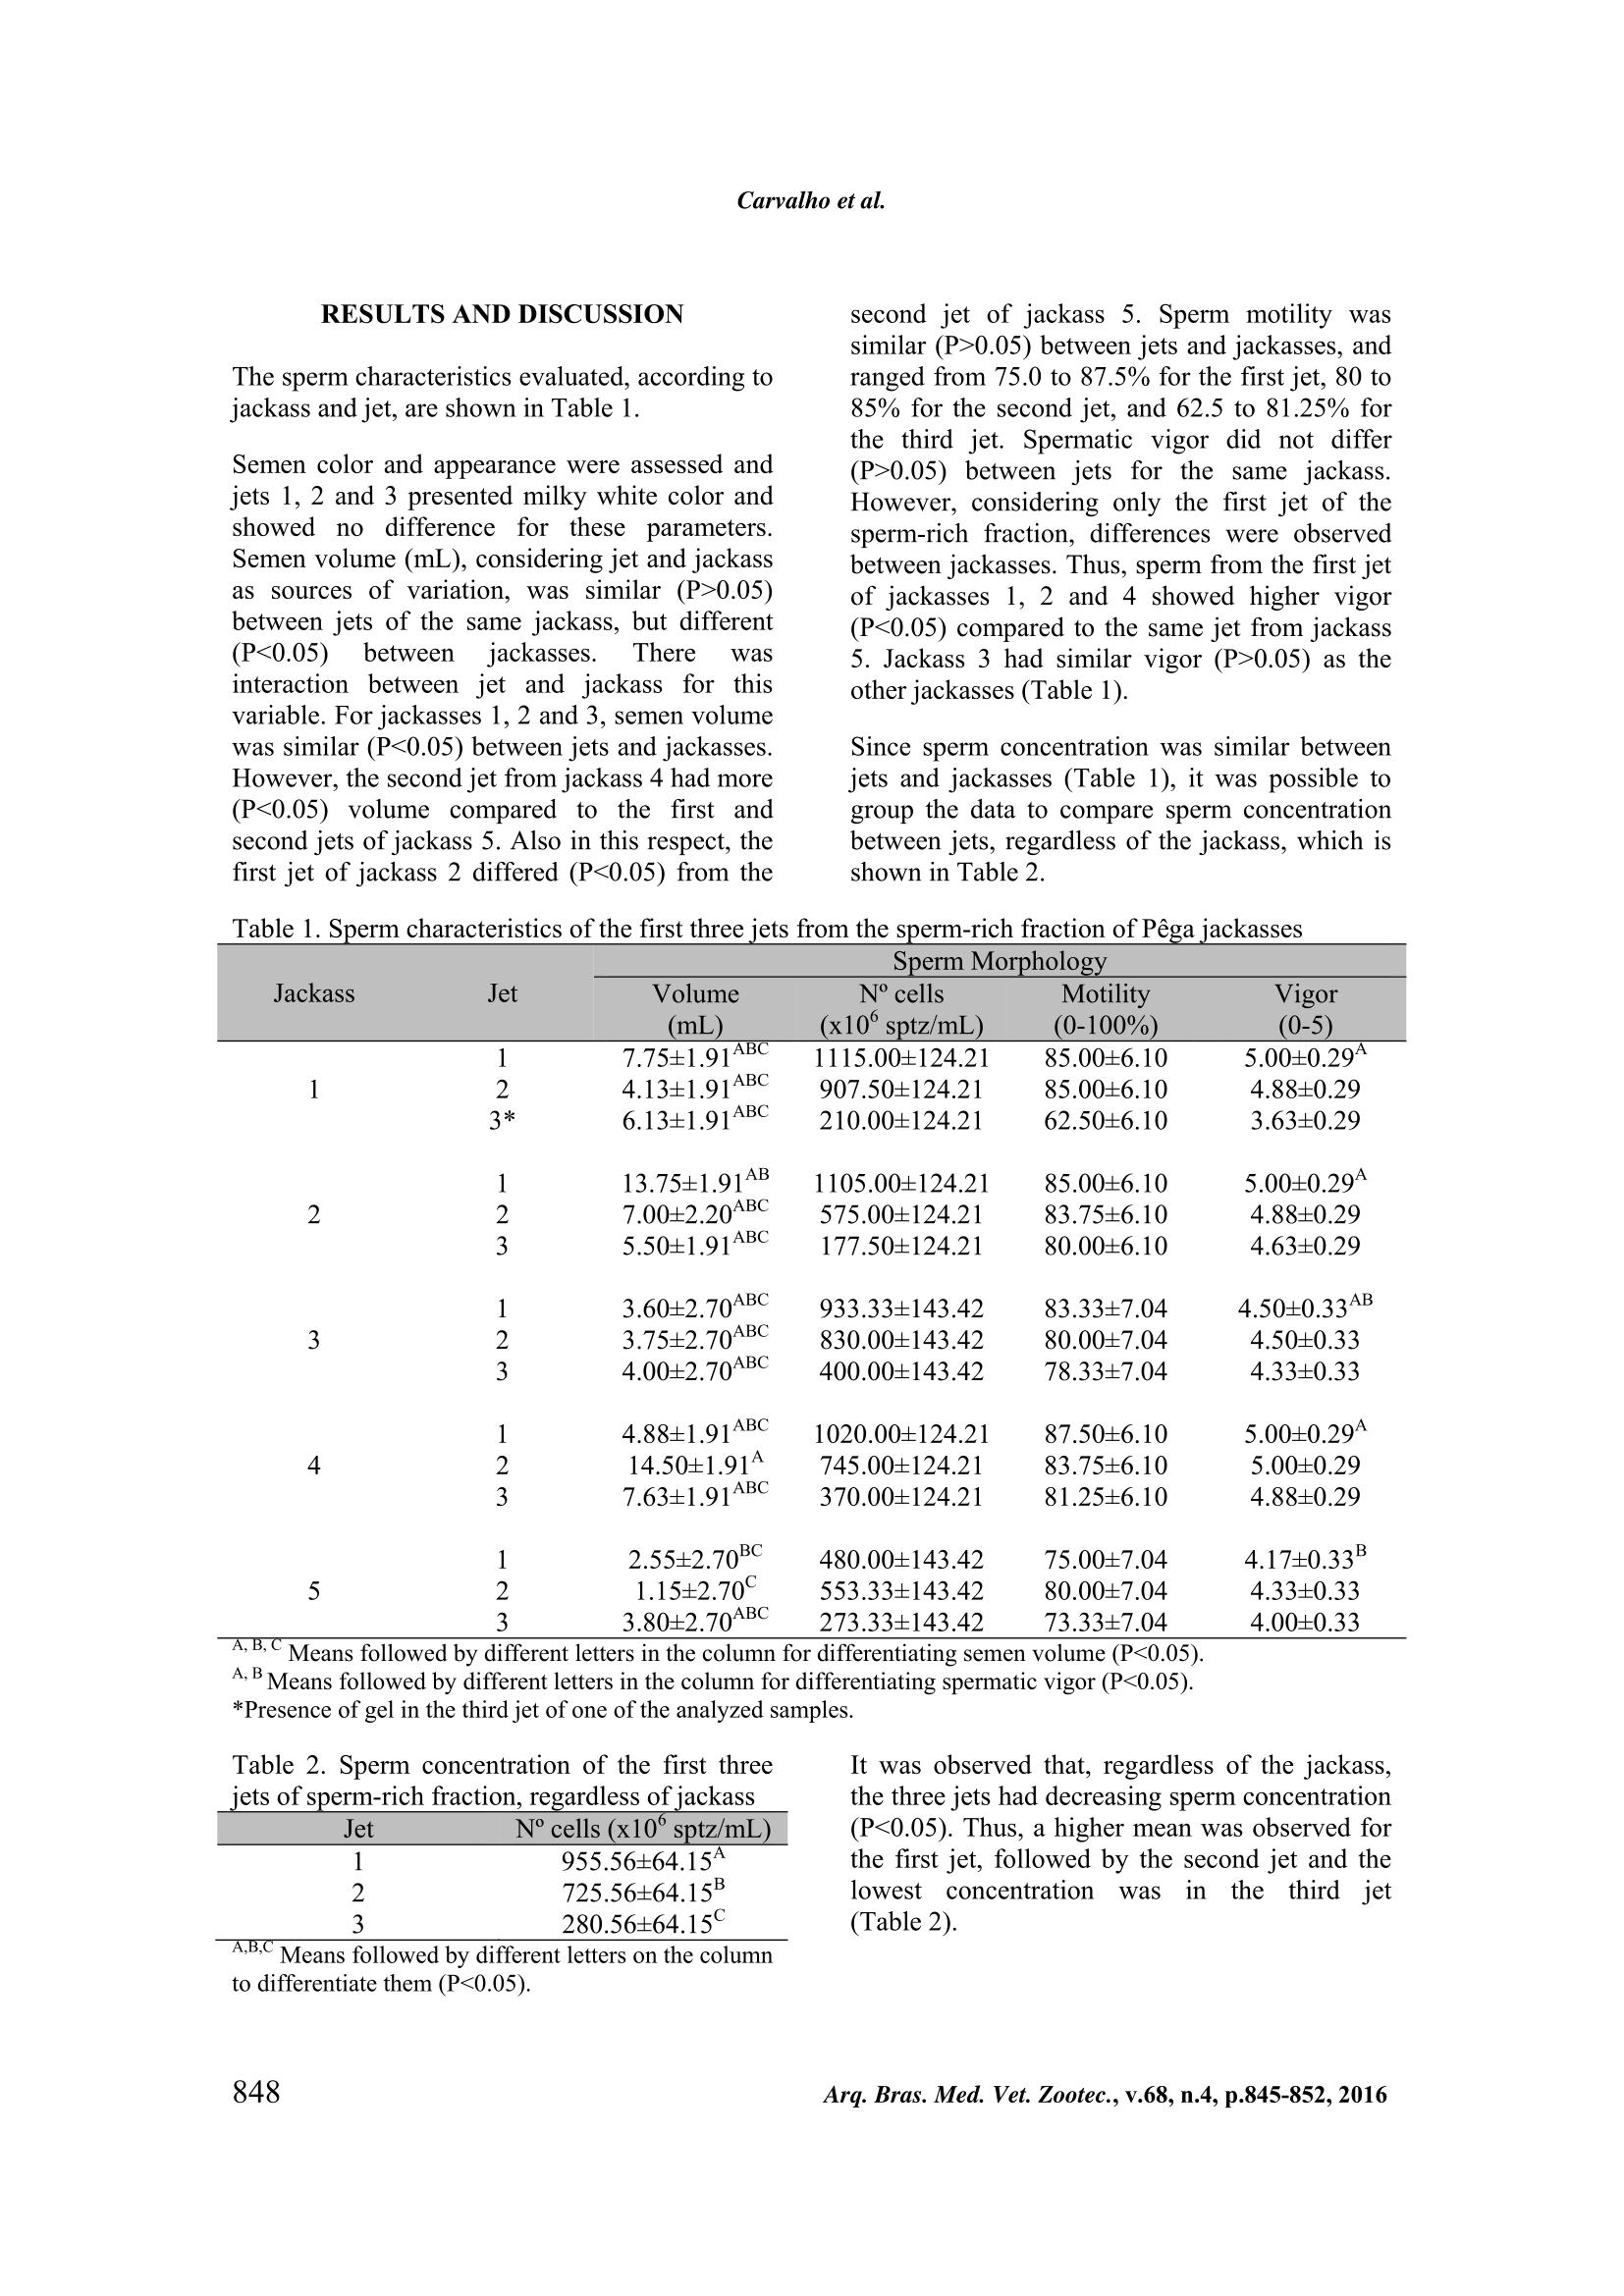 AMA 2-4 (1).png